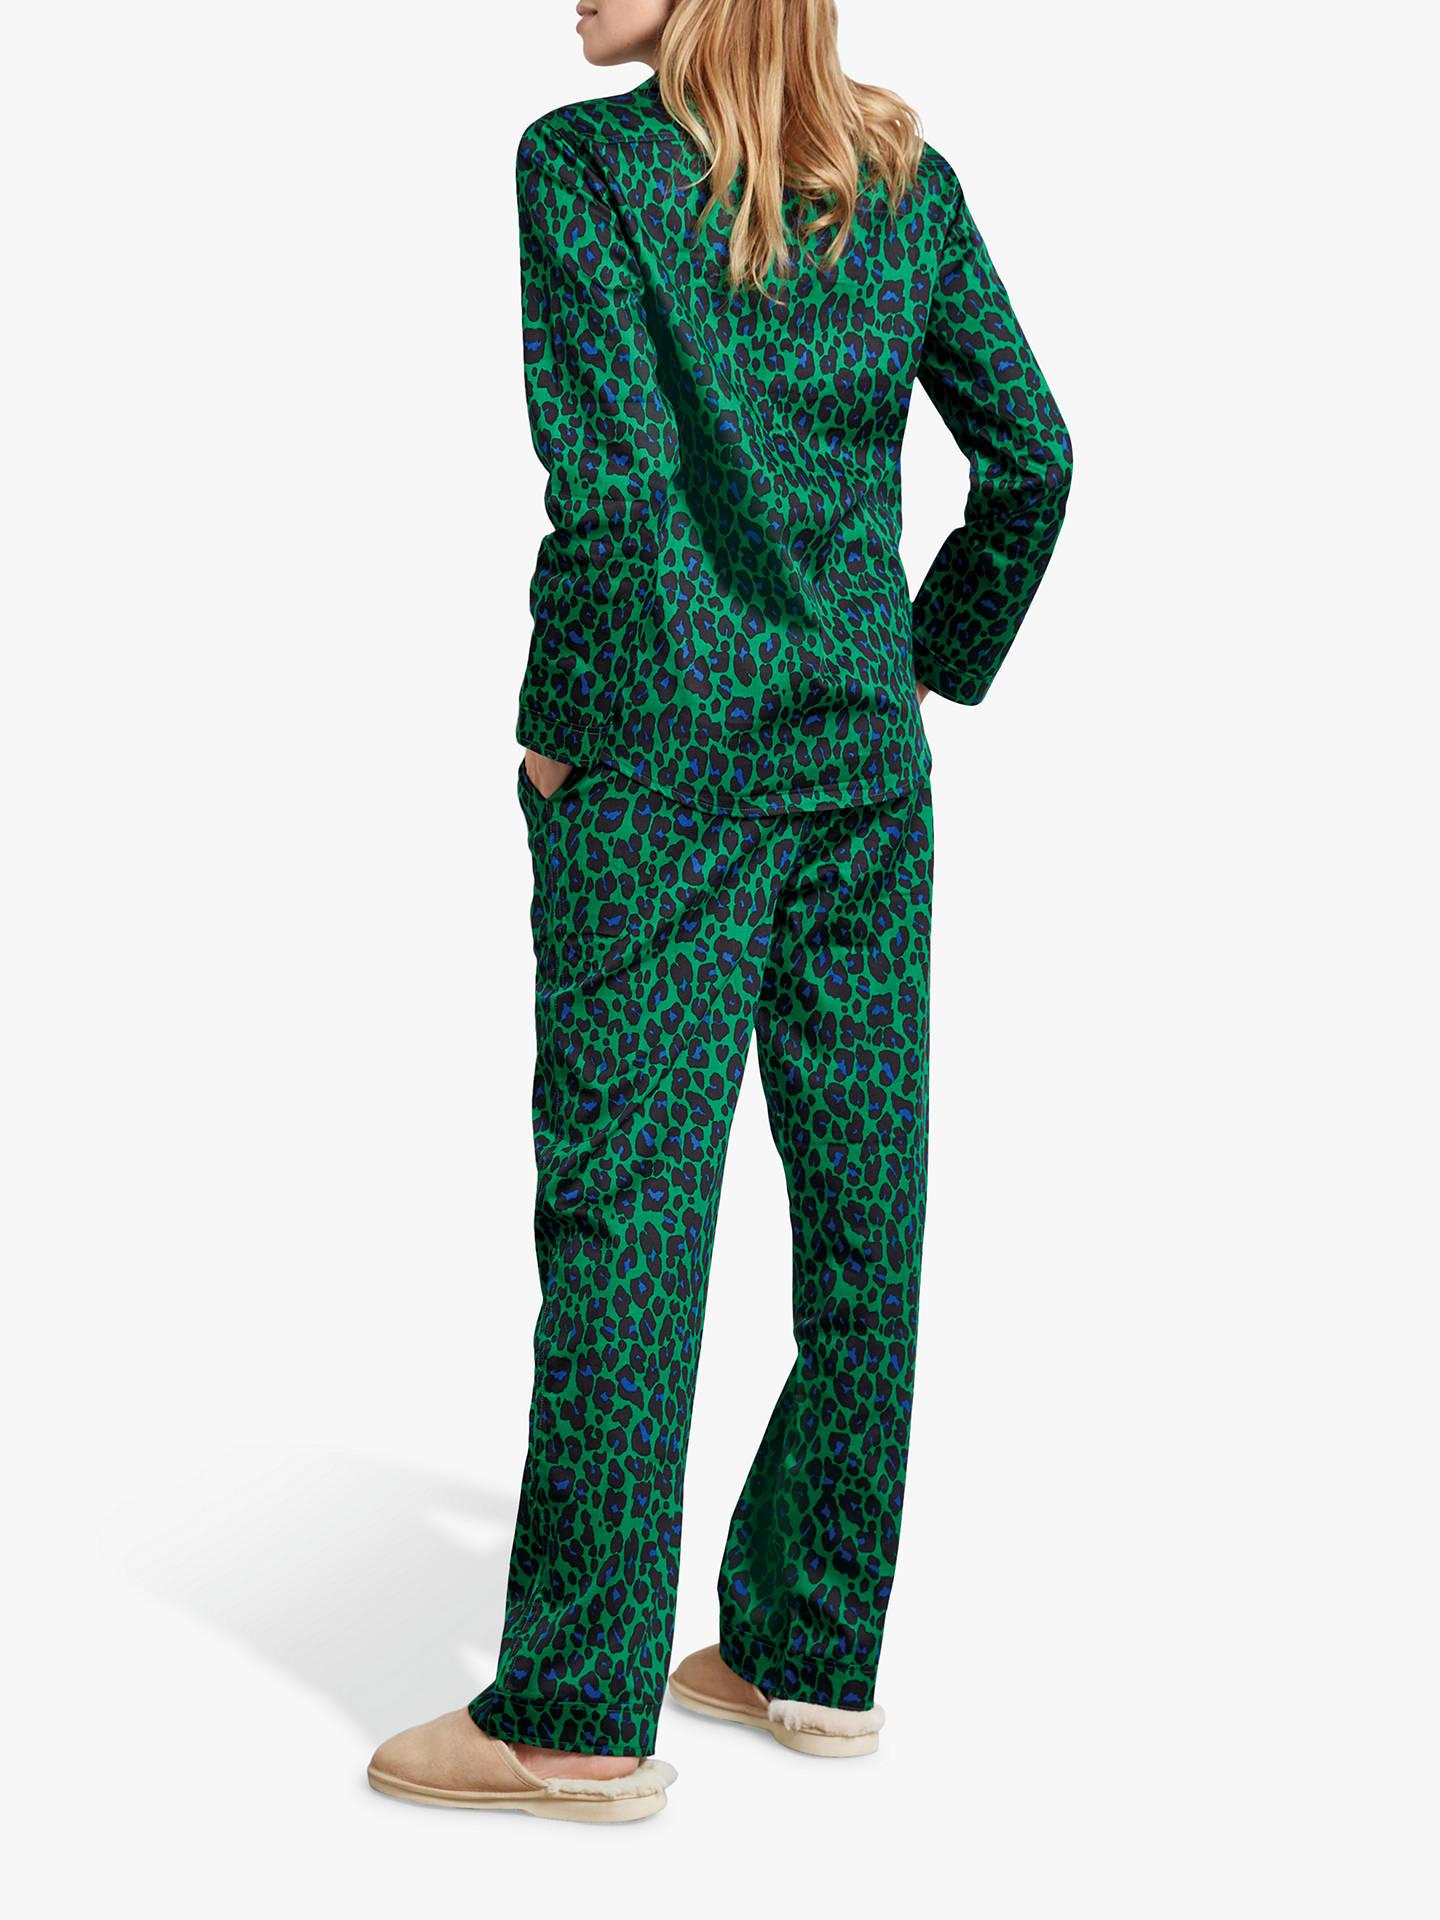 08a70ea5419 ... Buy hush Bright Leopard Print Cotton Pyjama Set, Green/Blue, XS Online  at ...